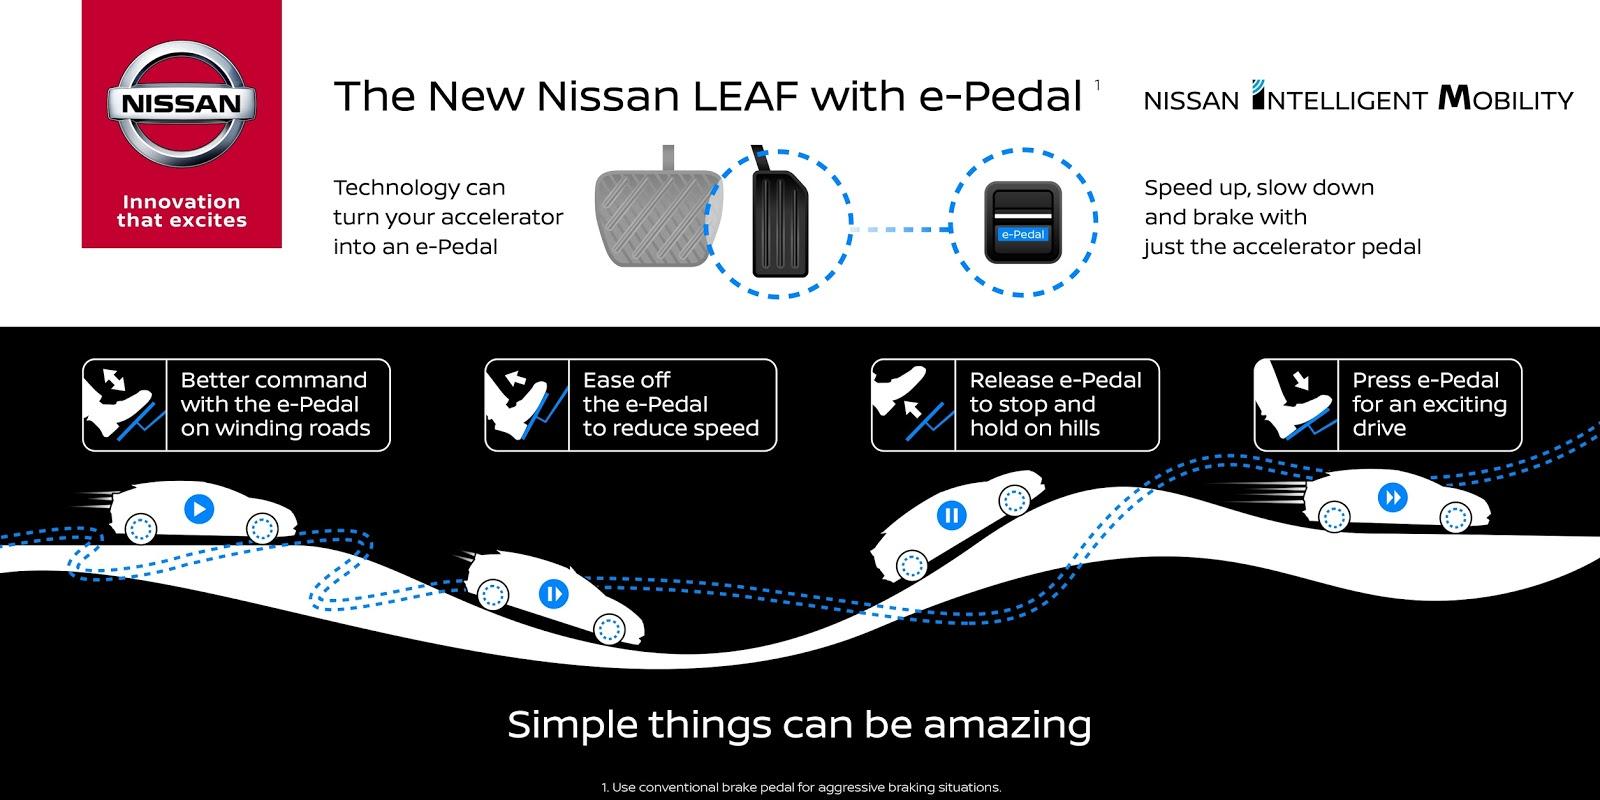 ePedal infographic LEAF2BTeaser Global Τι είναι το e-pedal που θα φοράει το Nissan Leaf video, videos, βίντεο